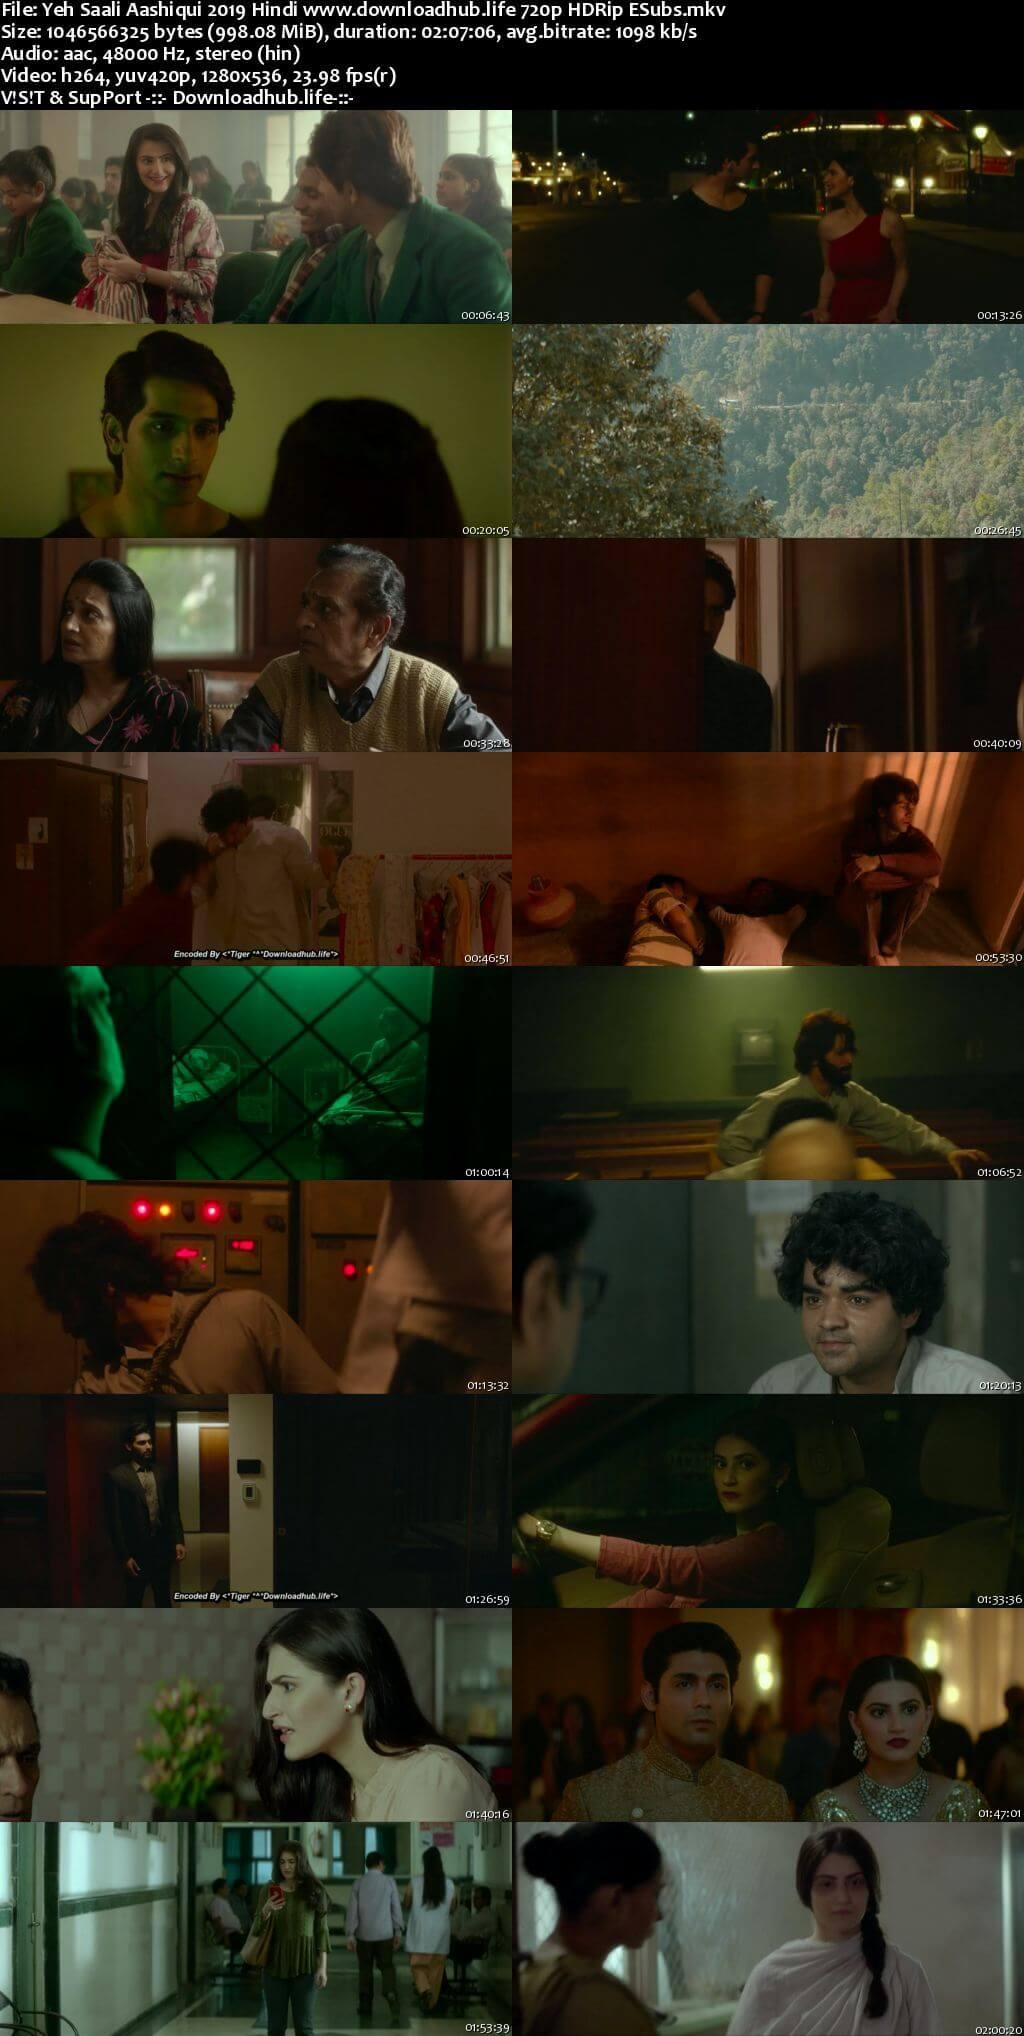 Yeh Saali Aashiqui 2019 Hindi 720p HDRip ESubs